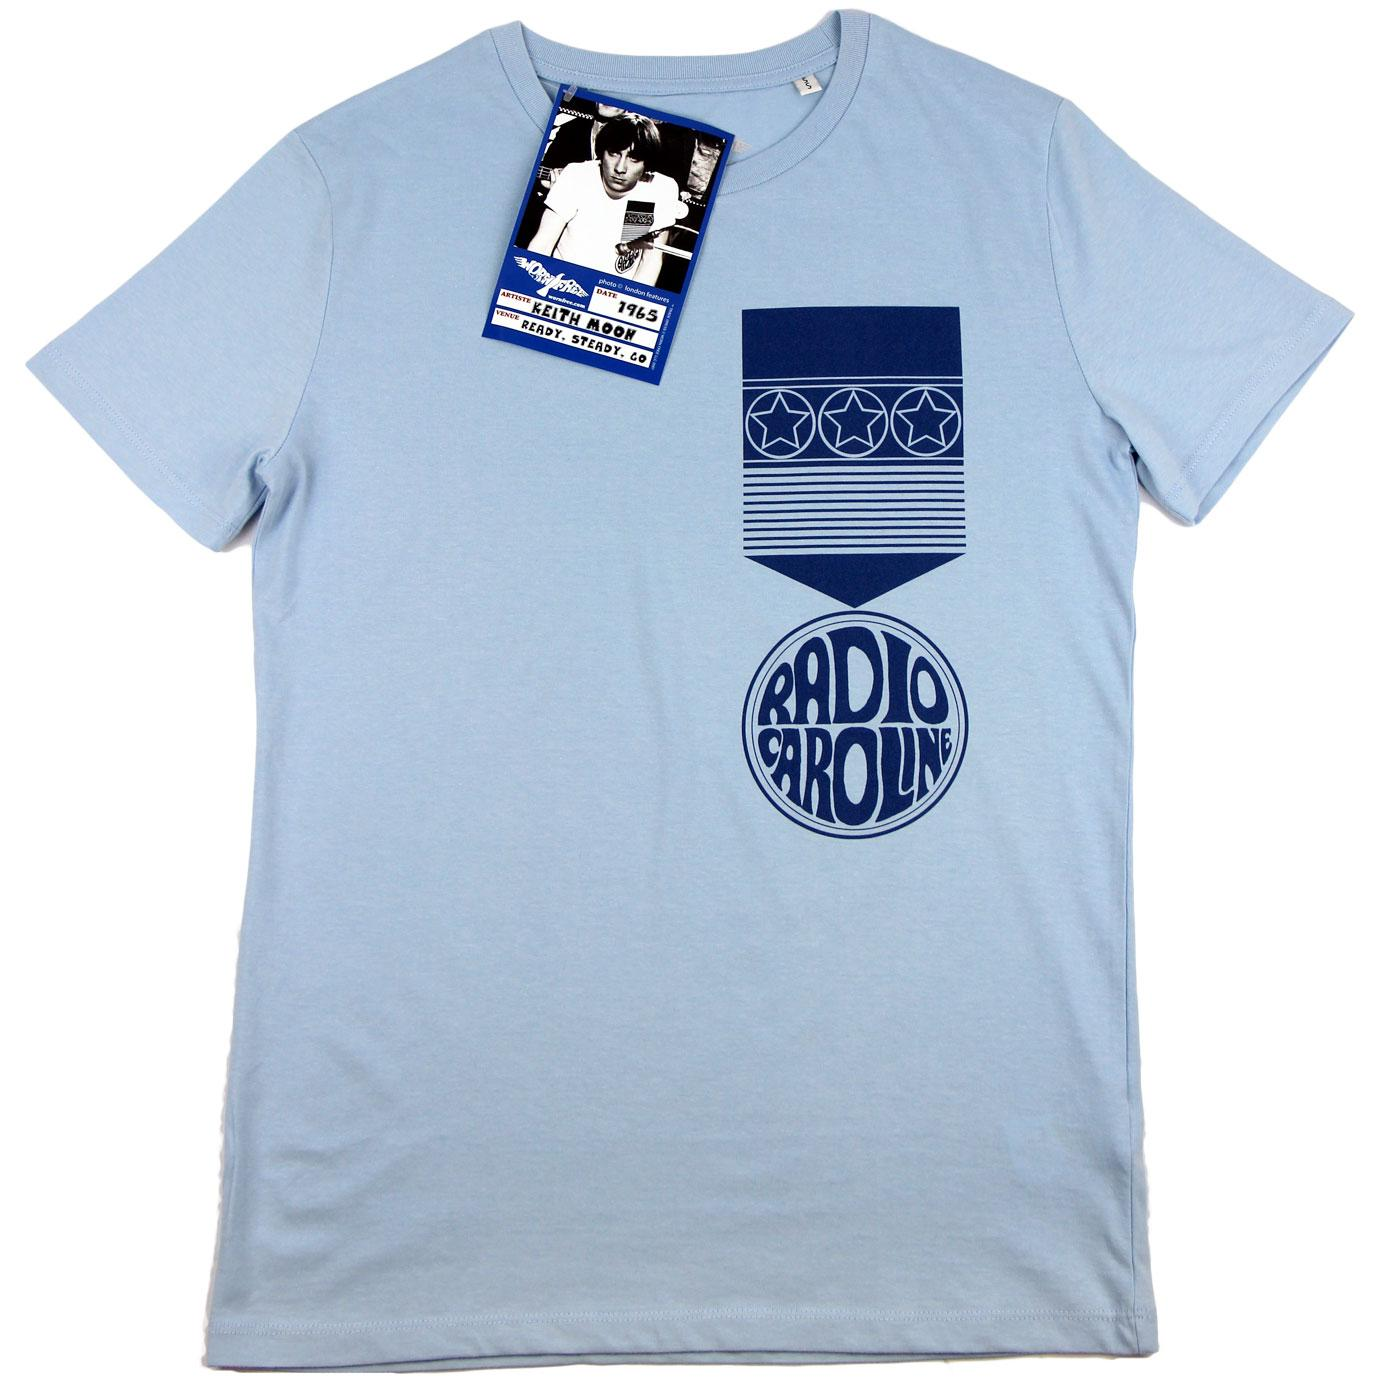 WORN FREE Keith Moon Radio Caroline Mod T-shirt